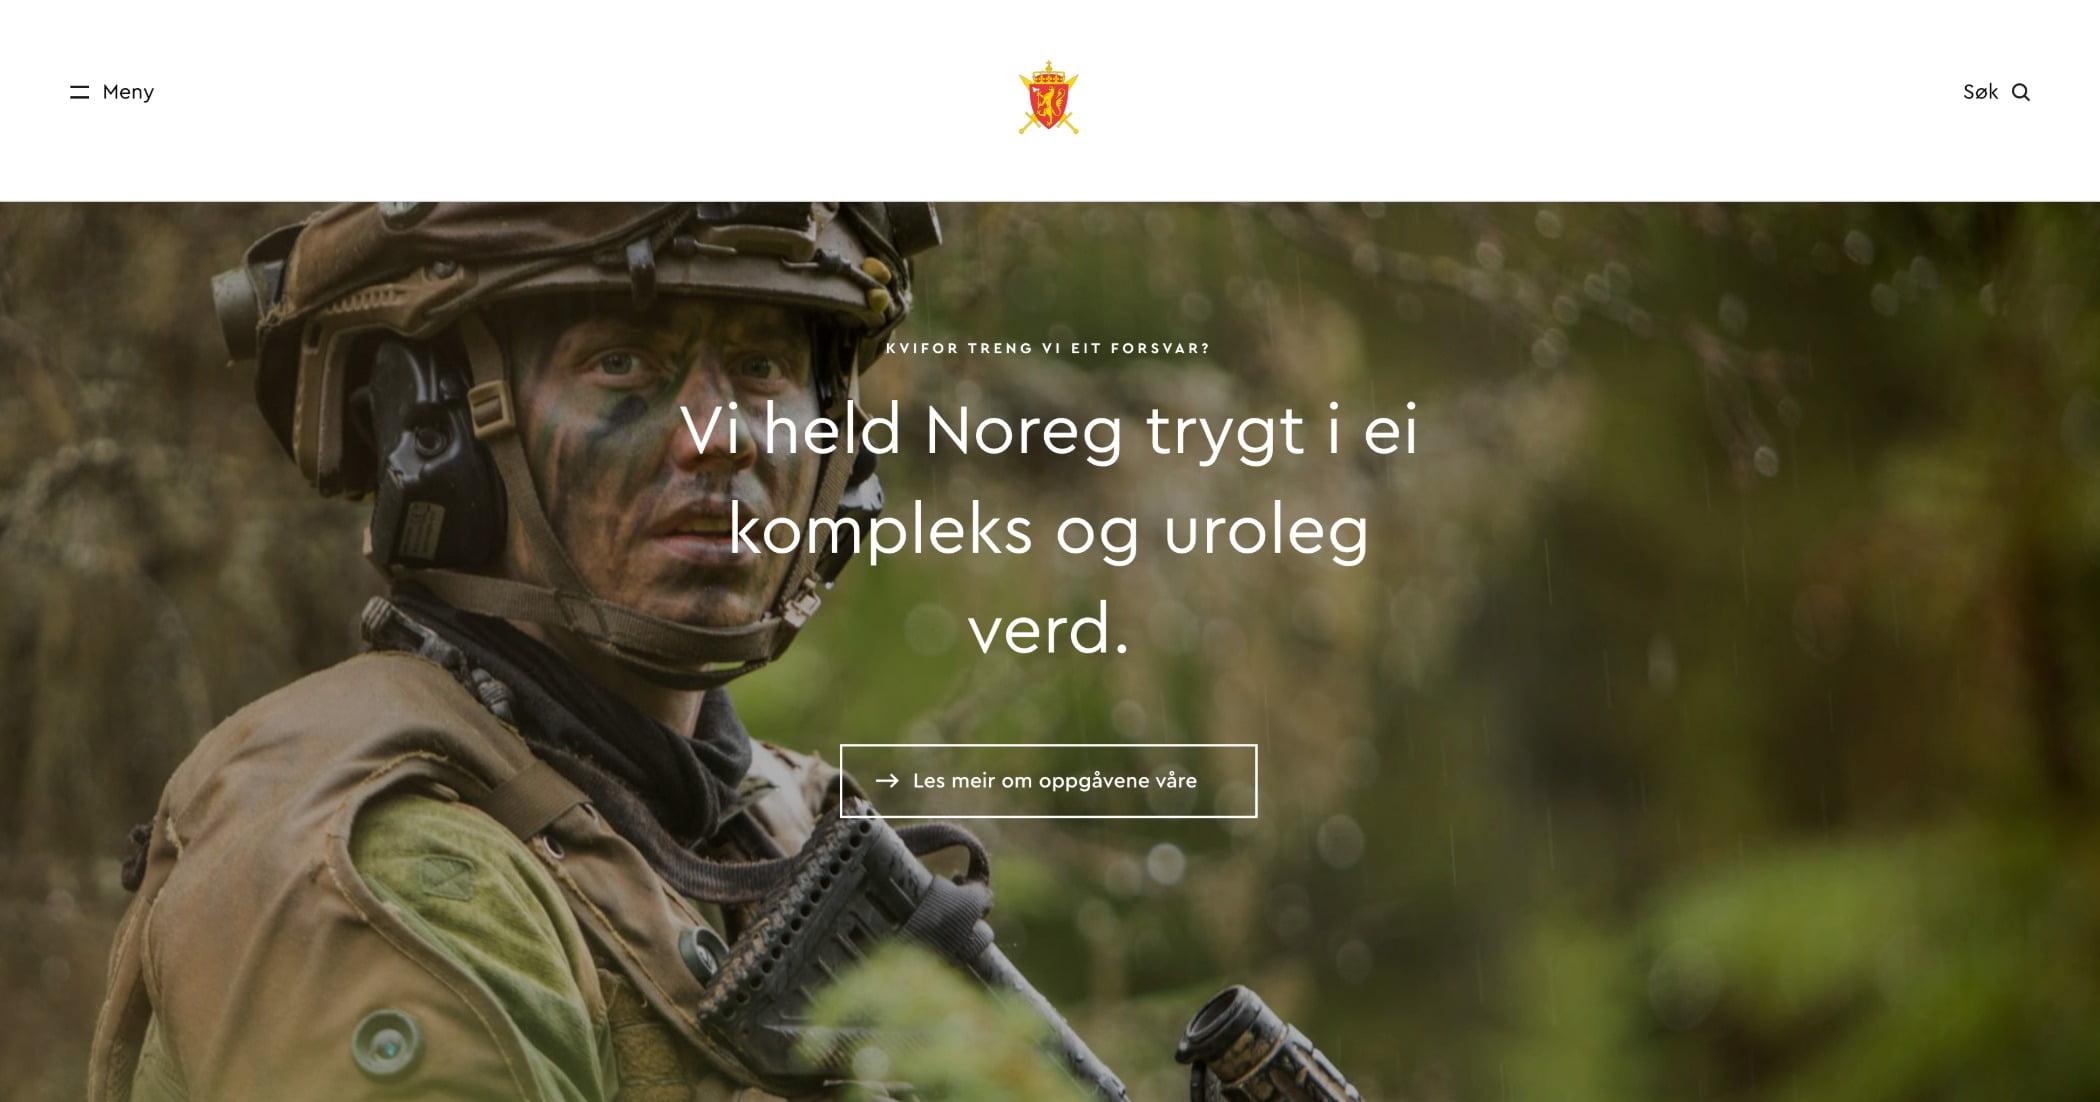 Military camouflage, Helmet, Marines, Soldier